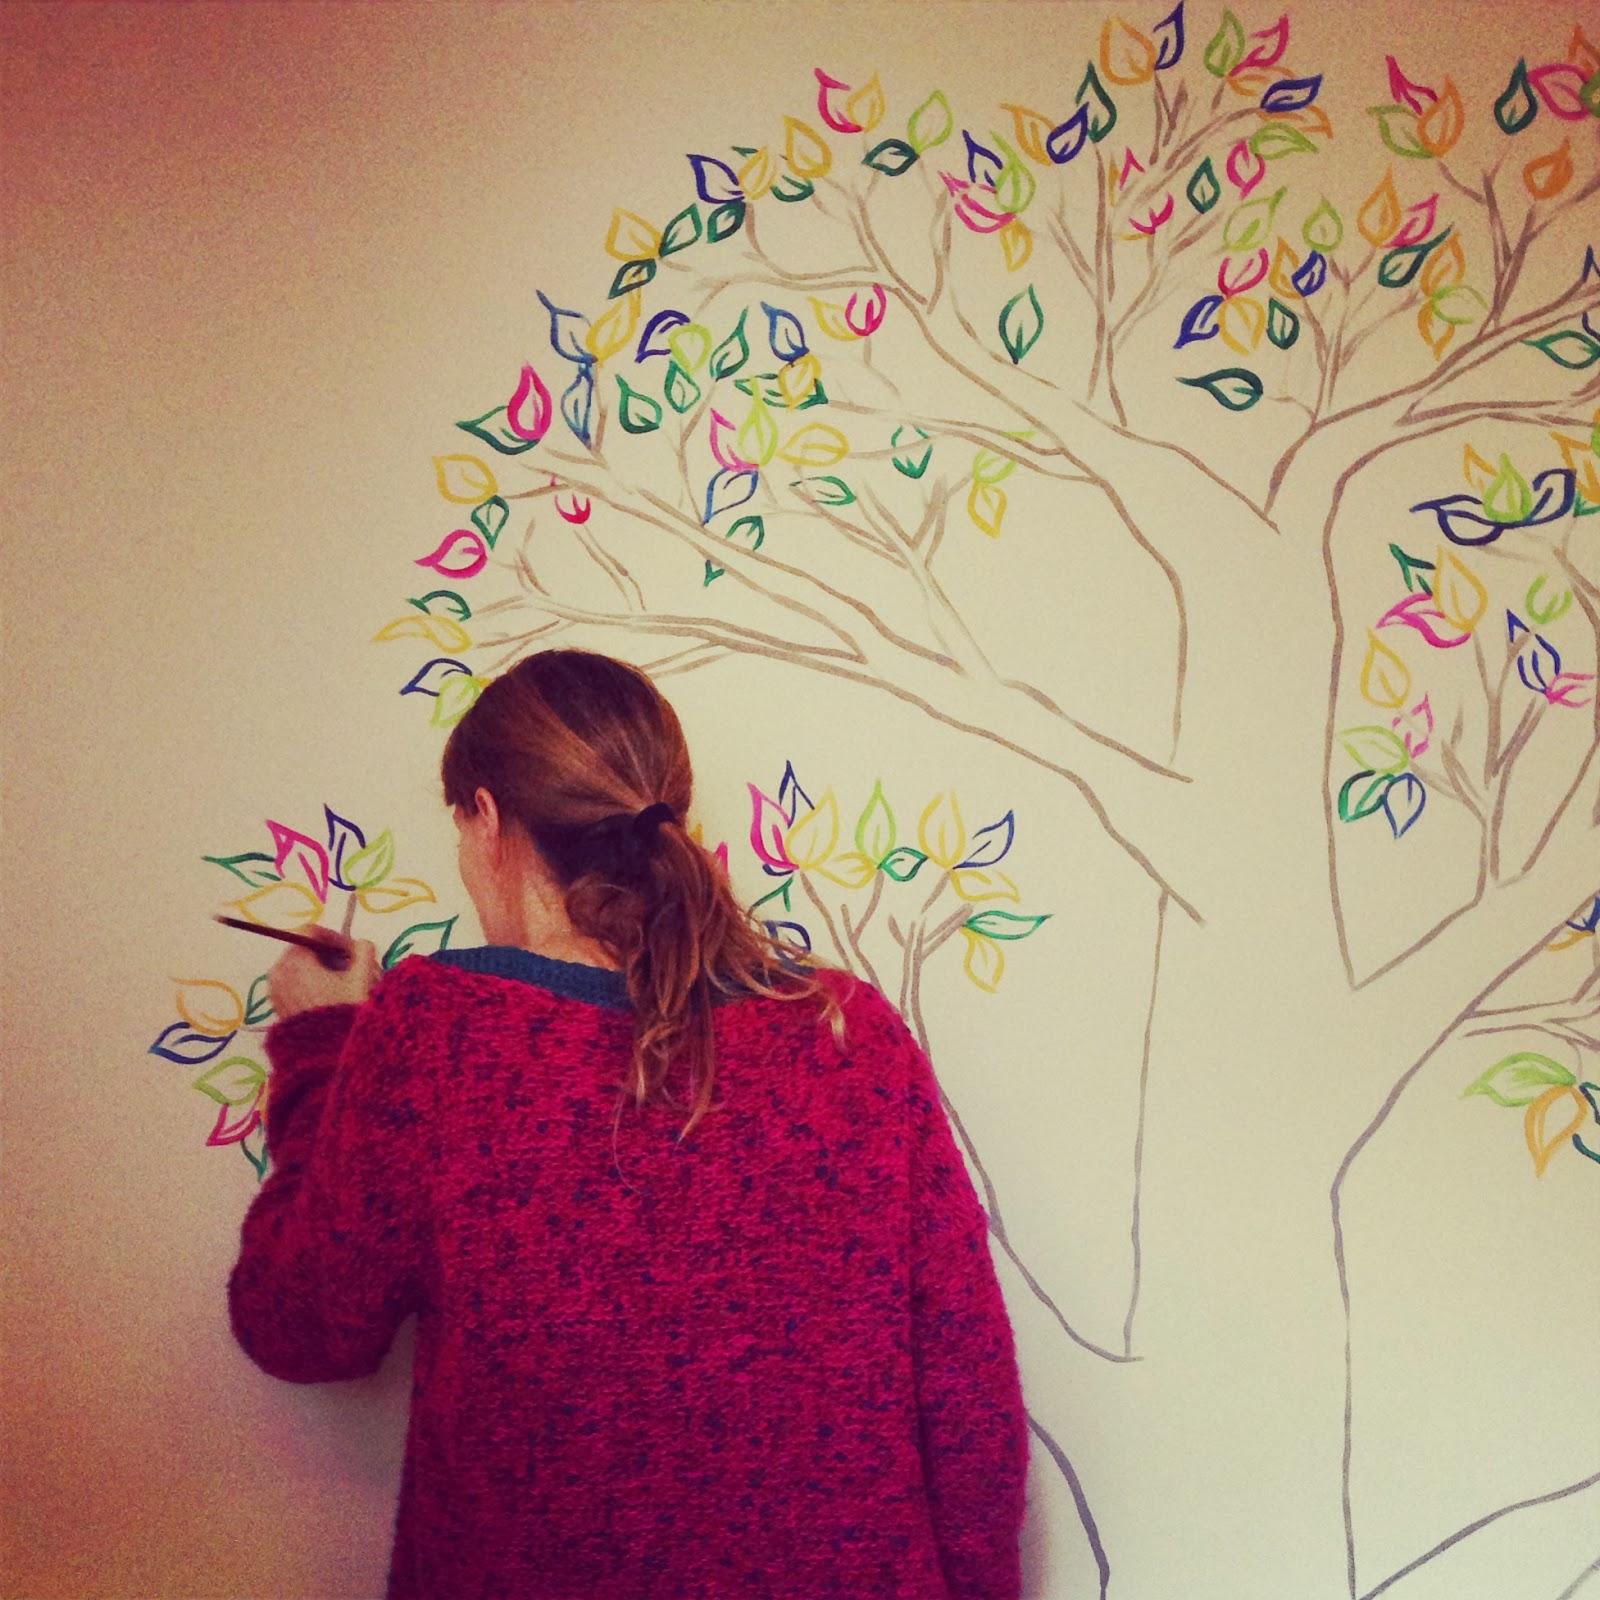 Mural para martina rbol de colores rojosill n for Como dibujar un mural en la pared